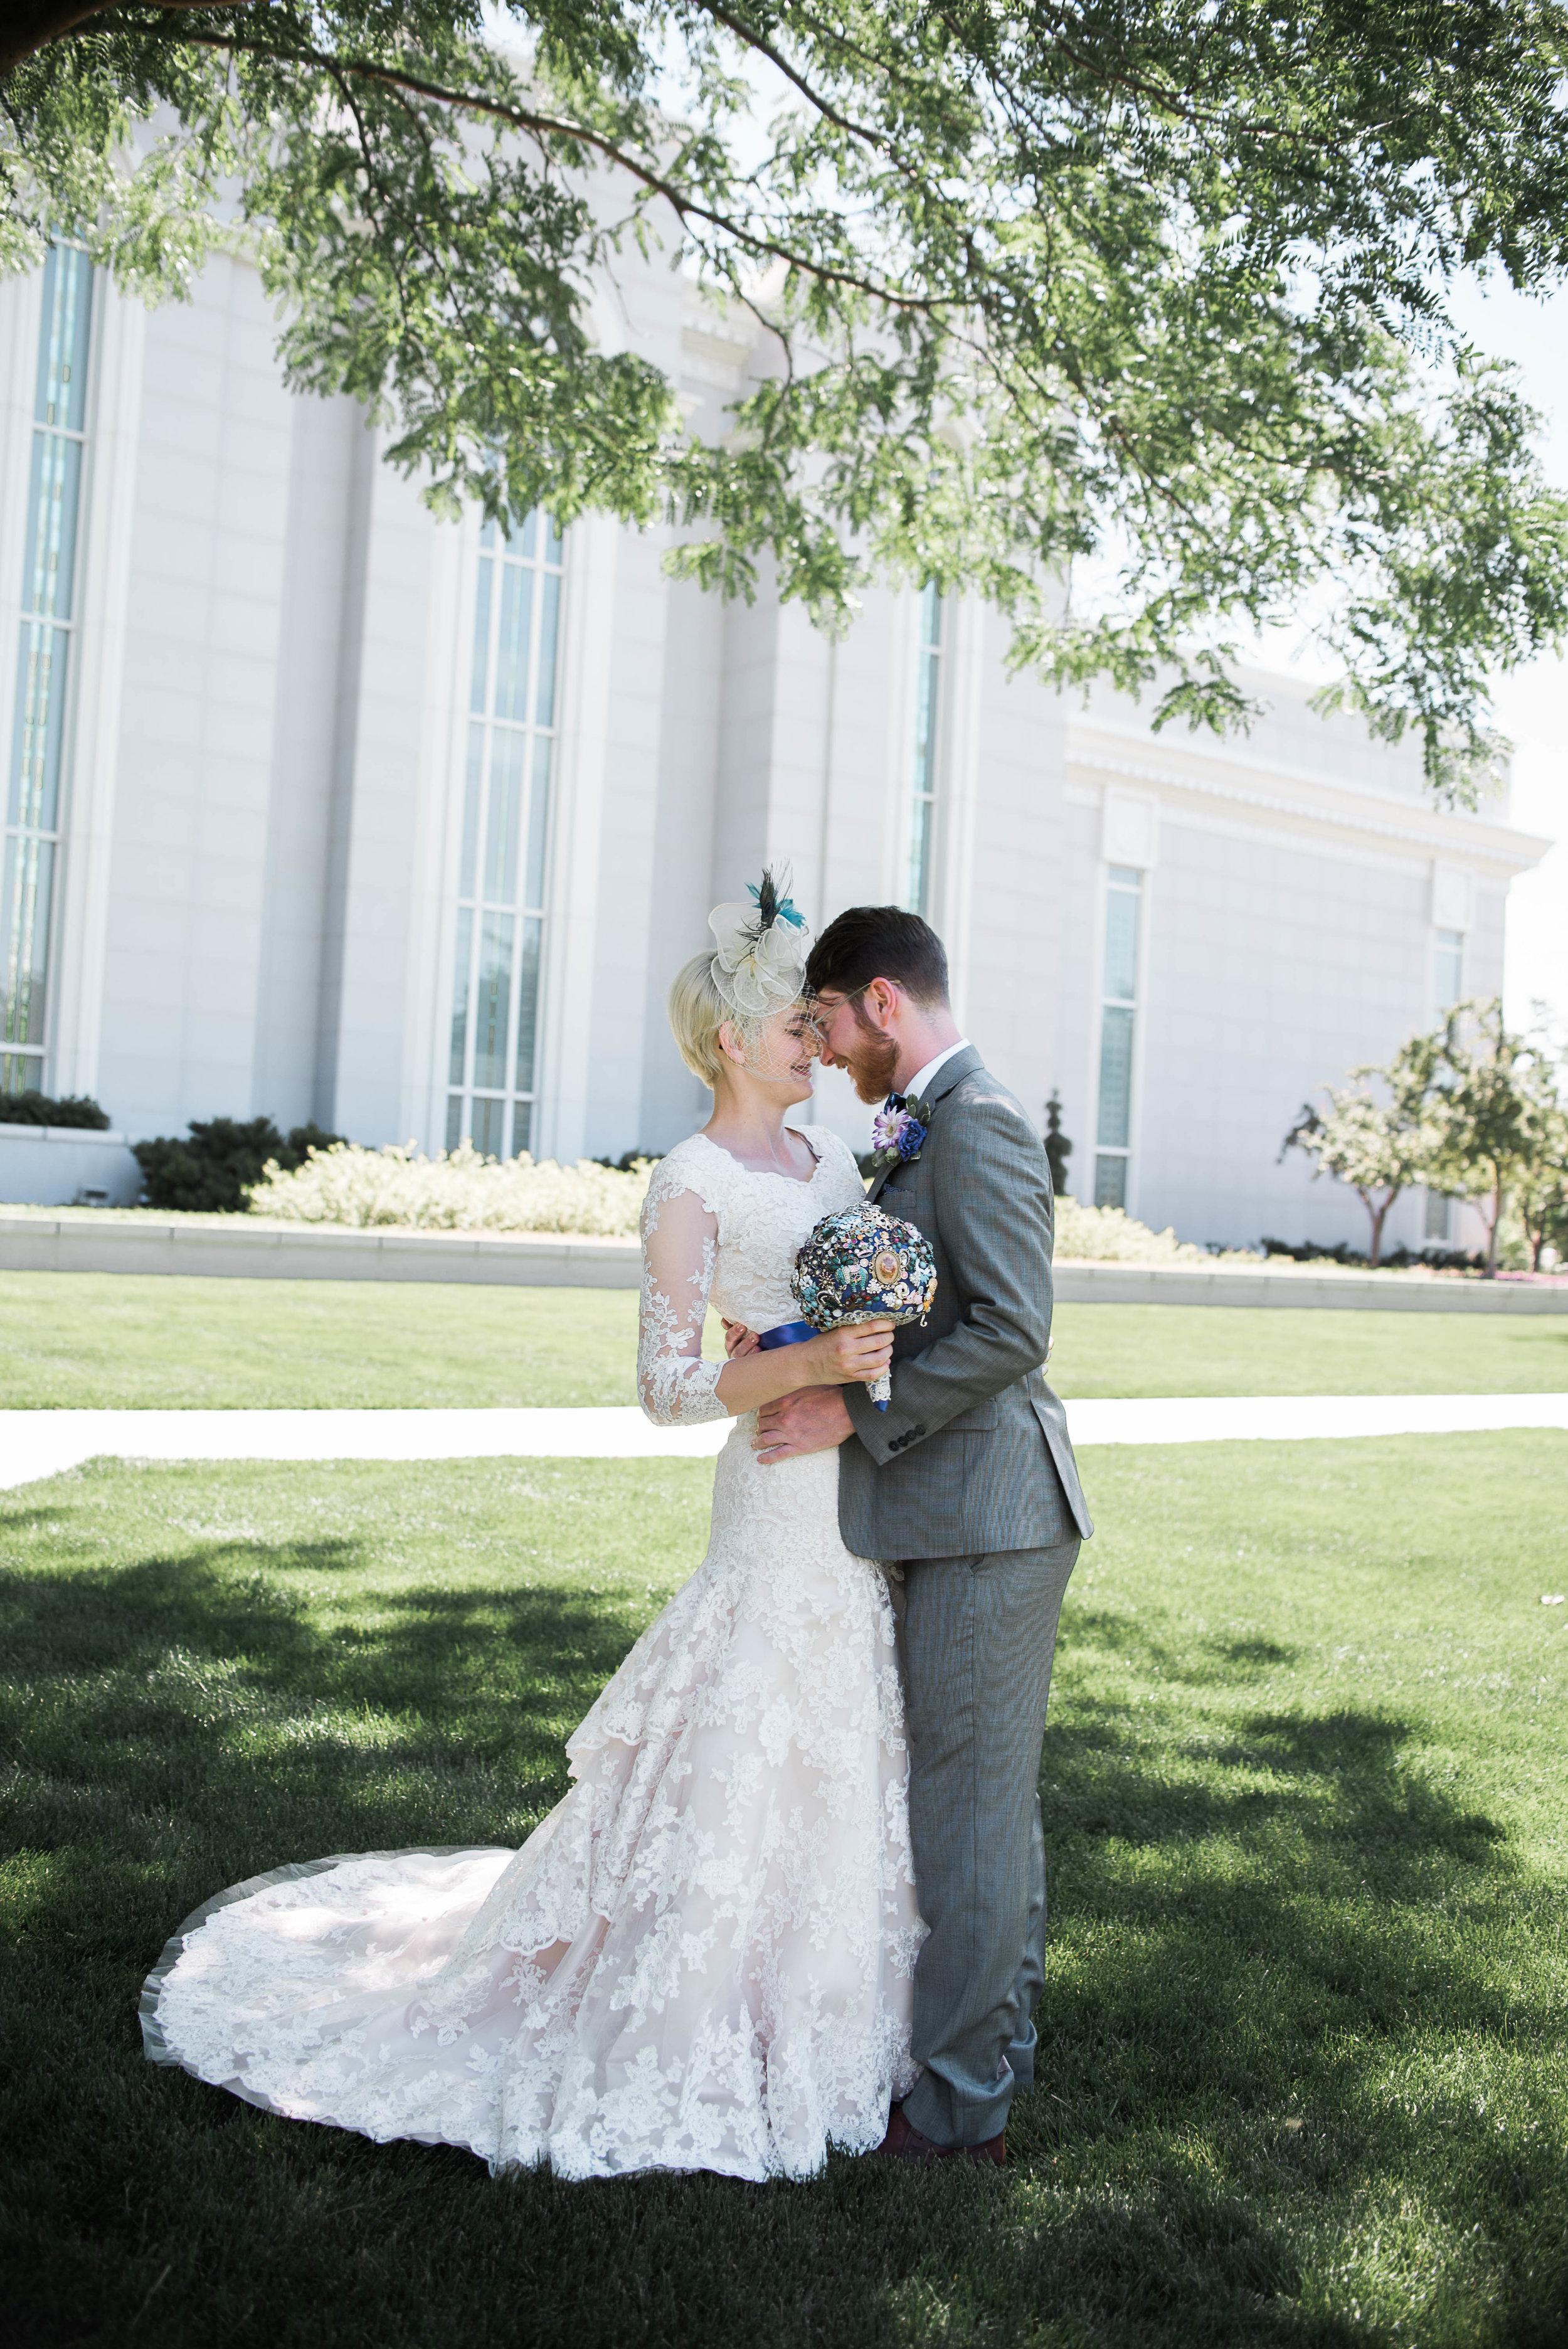 K+M-Wedding-DaySadie_Banks_Photography-538.jpg